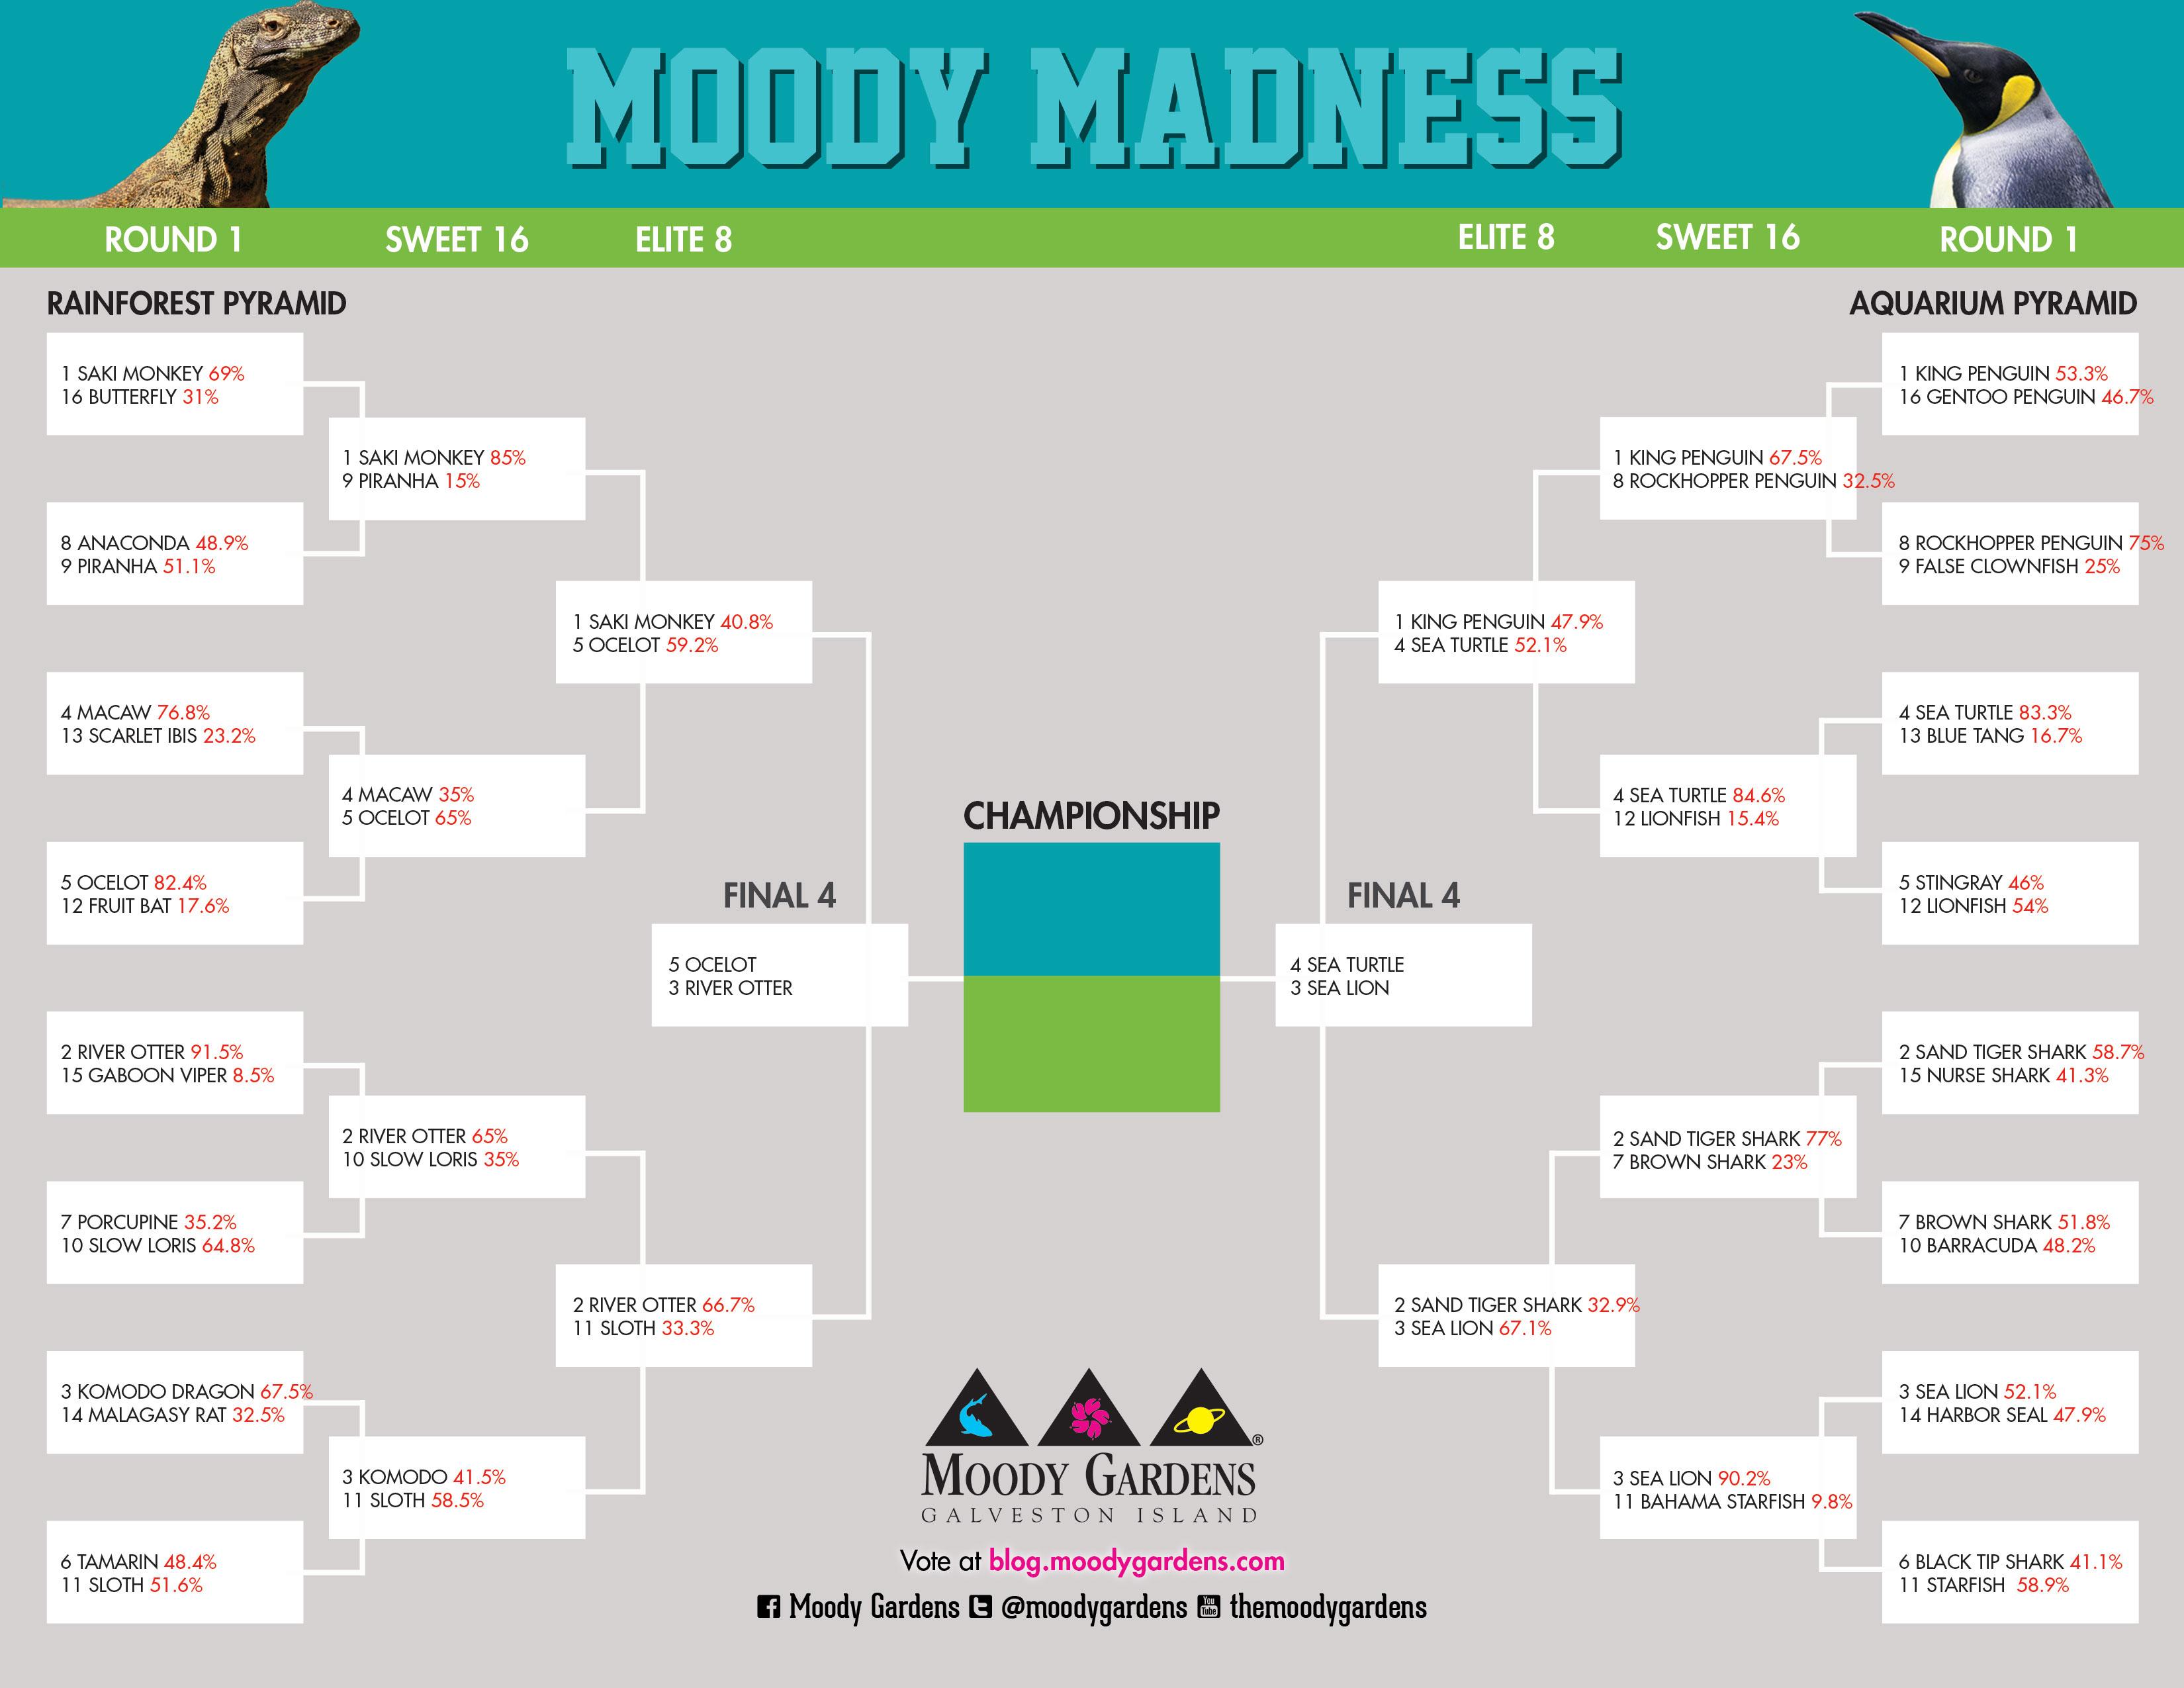 Moody Madness: Final 4